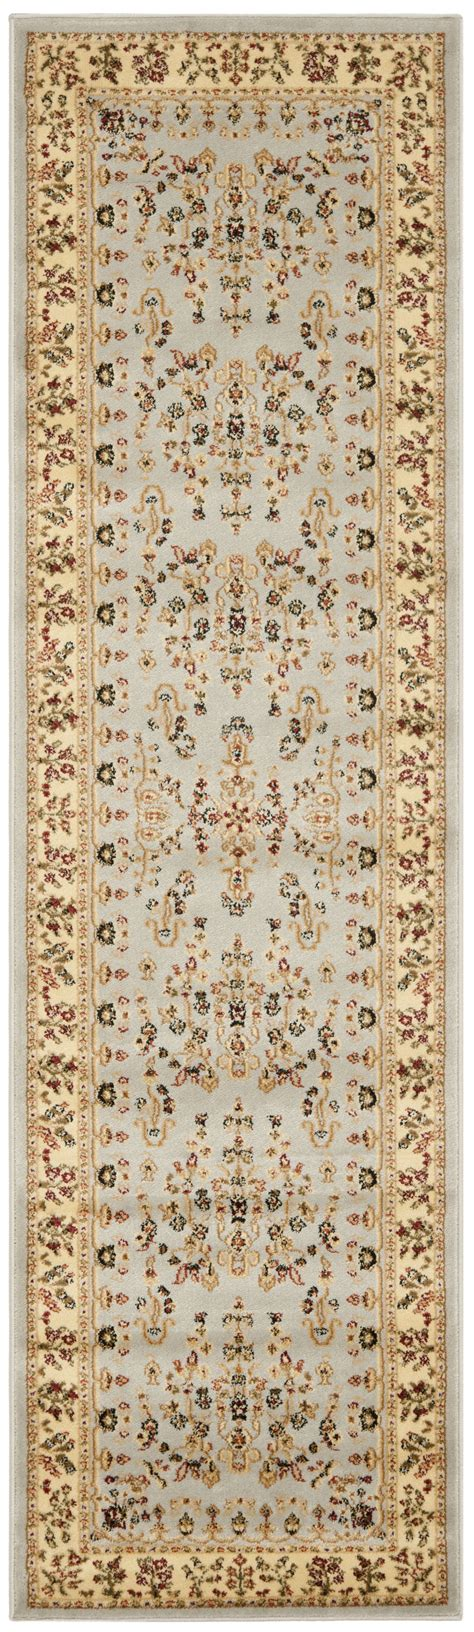 safavieh rug runners safavieh lyndhurst polypropylene grey beige runner rug 2